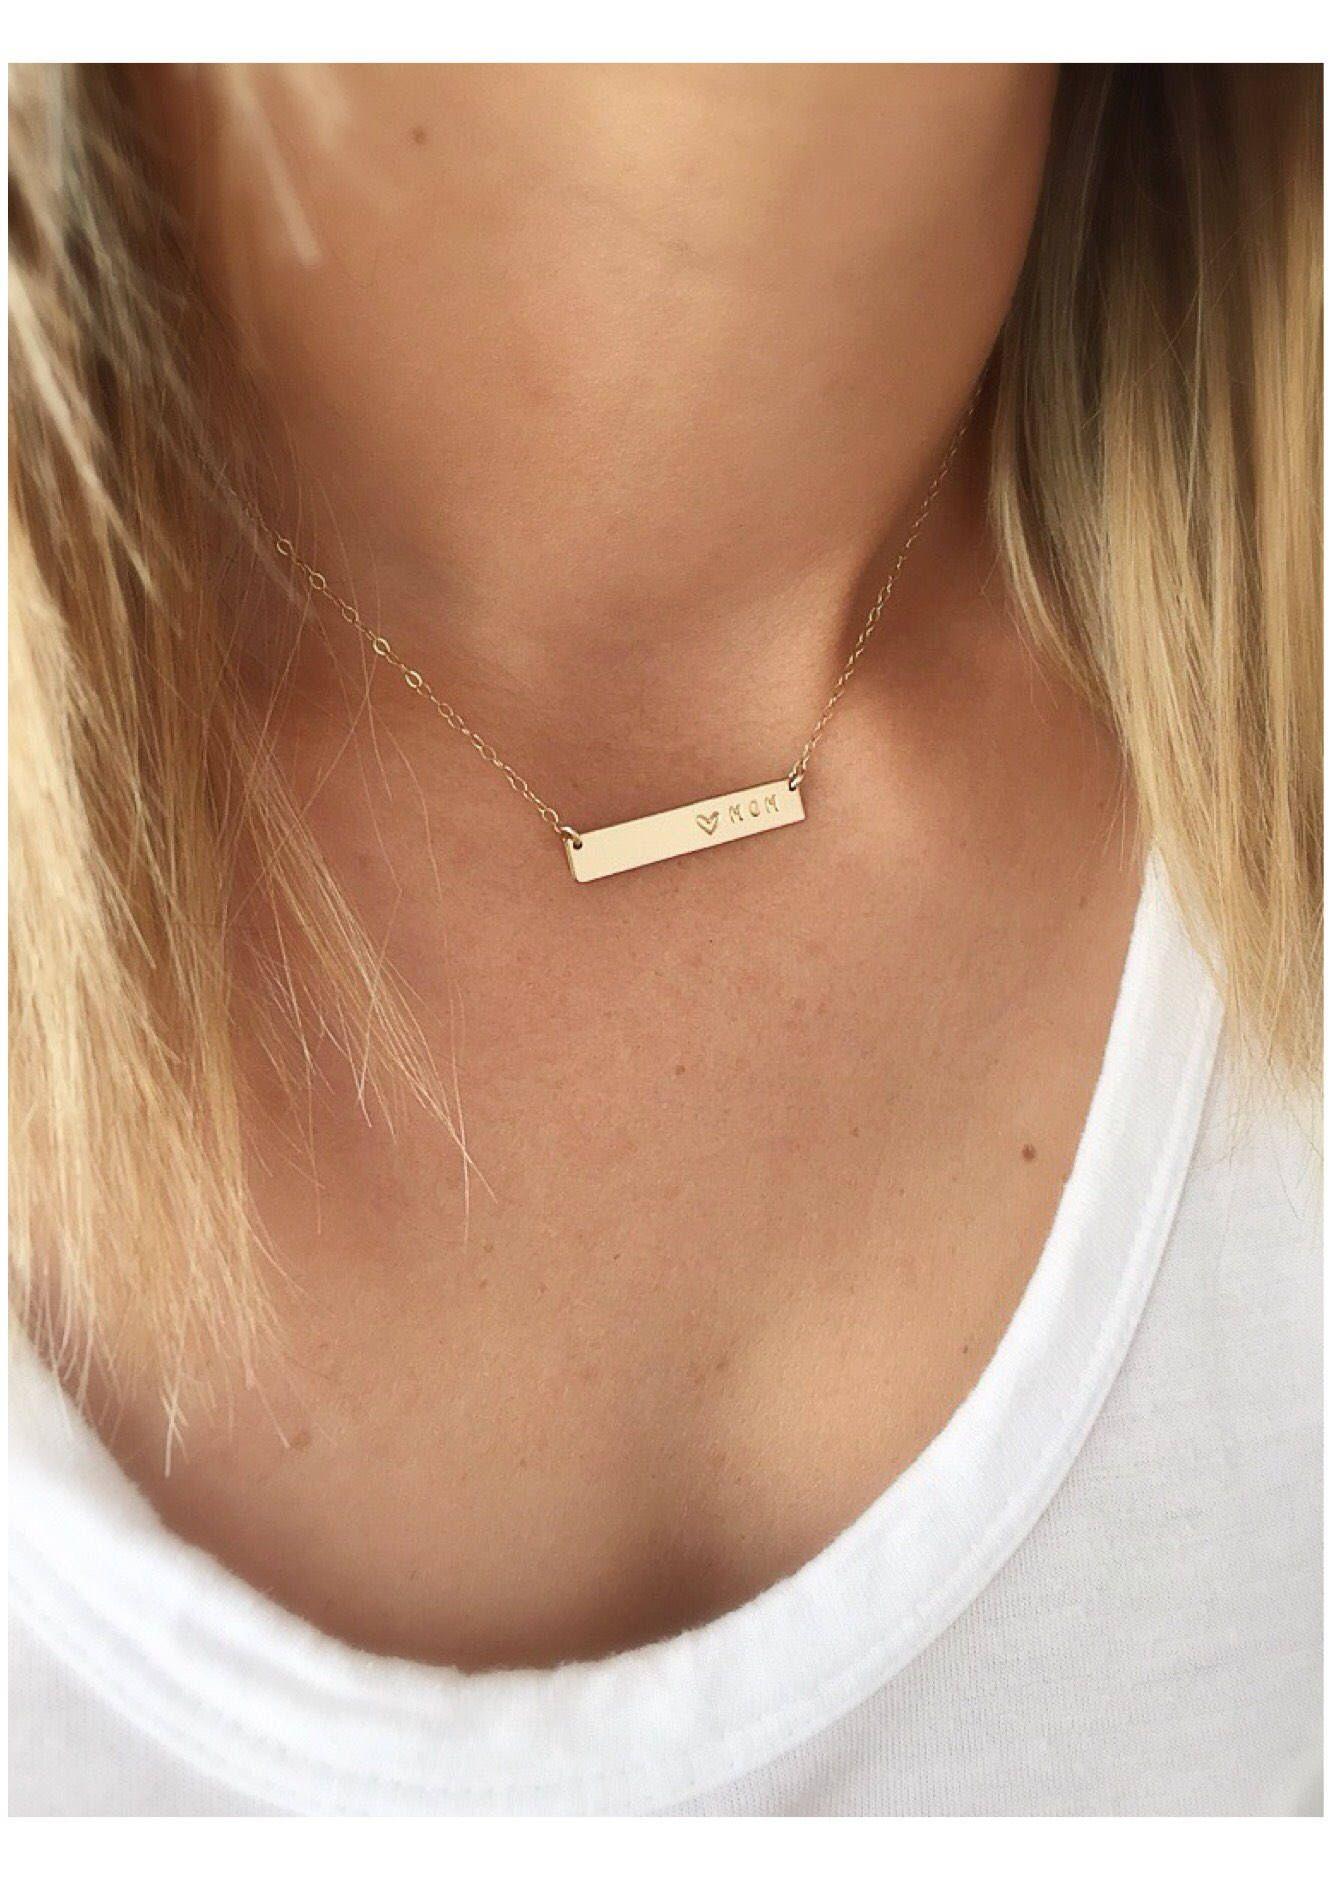 14k Gold Bar Necklace Dainty Gold Bar Necklace Custom Etsy Gold Bar Pendant Necklace Custom Bar Necklace Bar Necklace Personalized